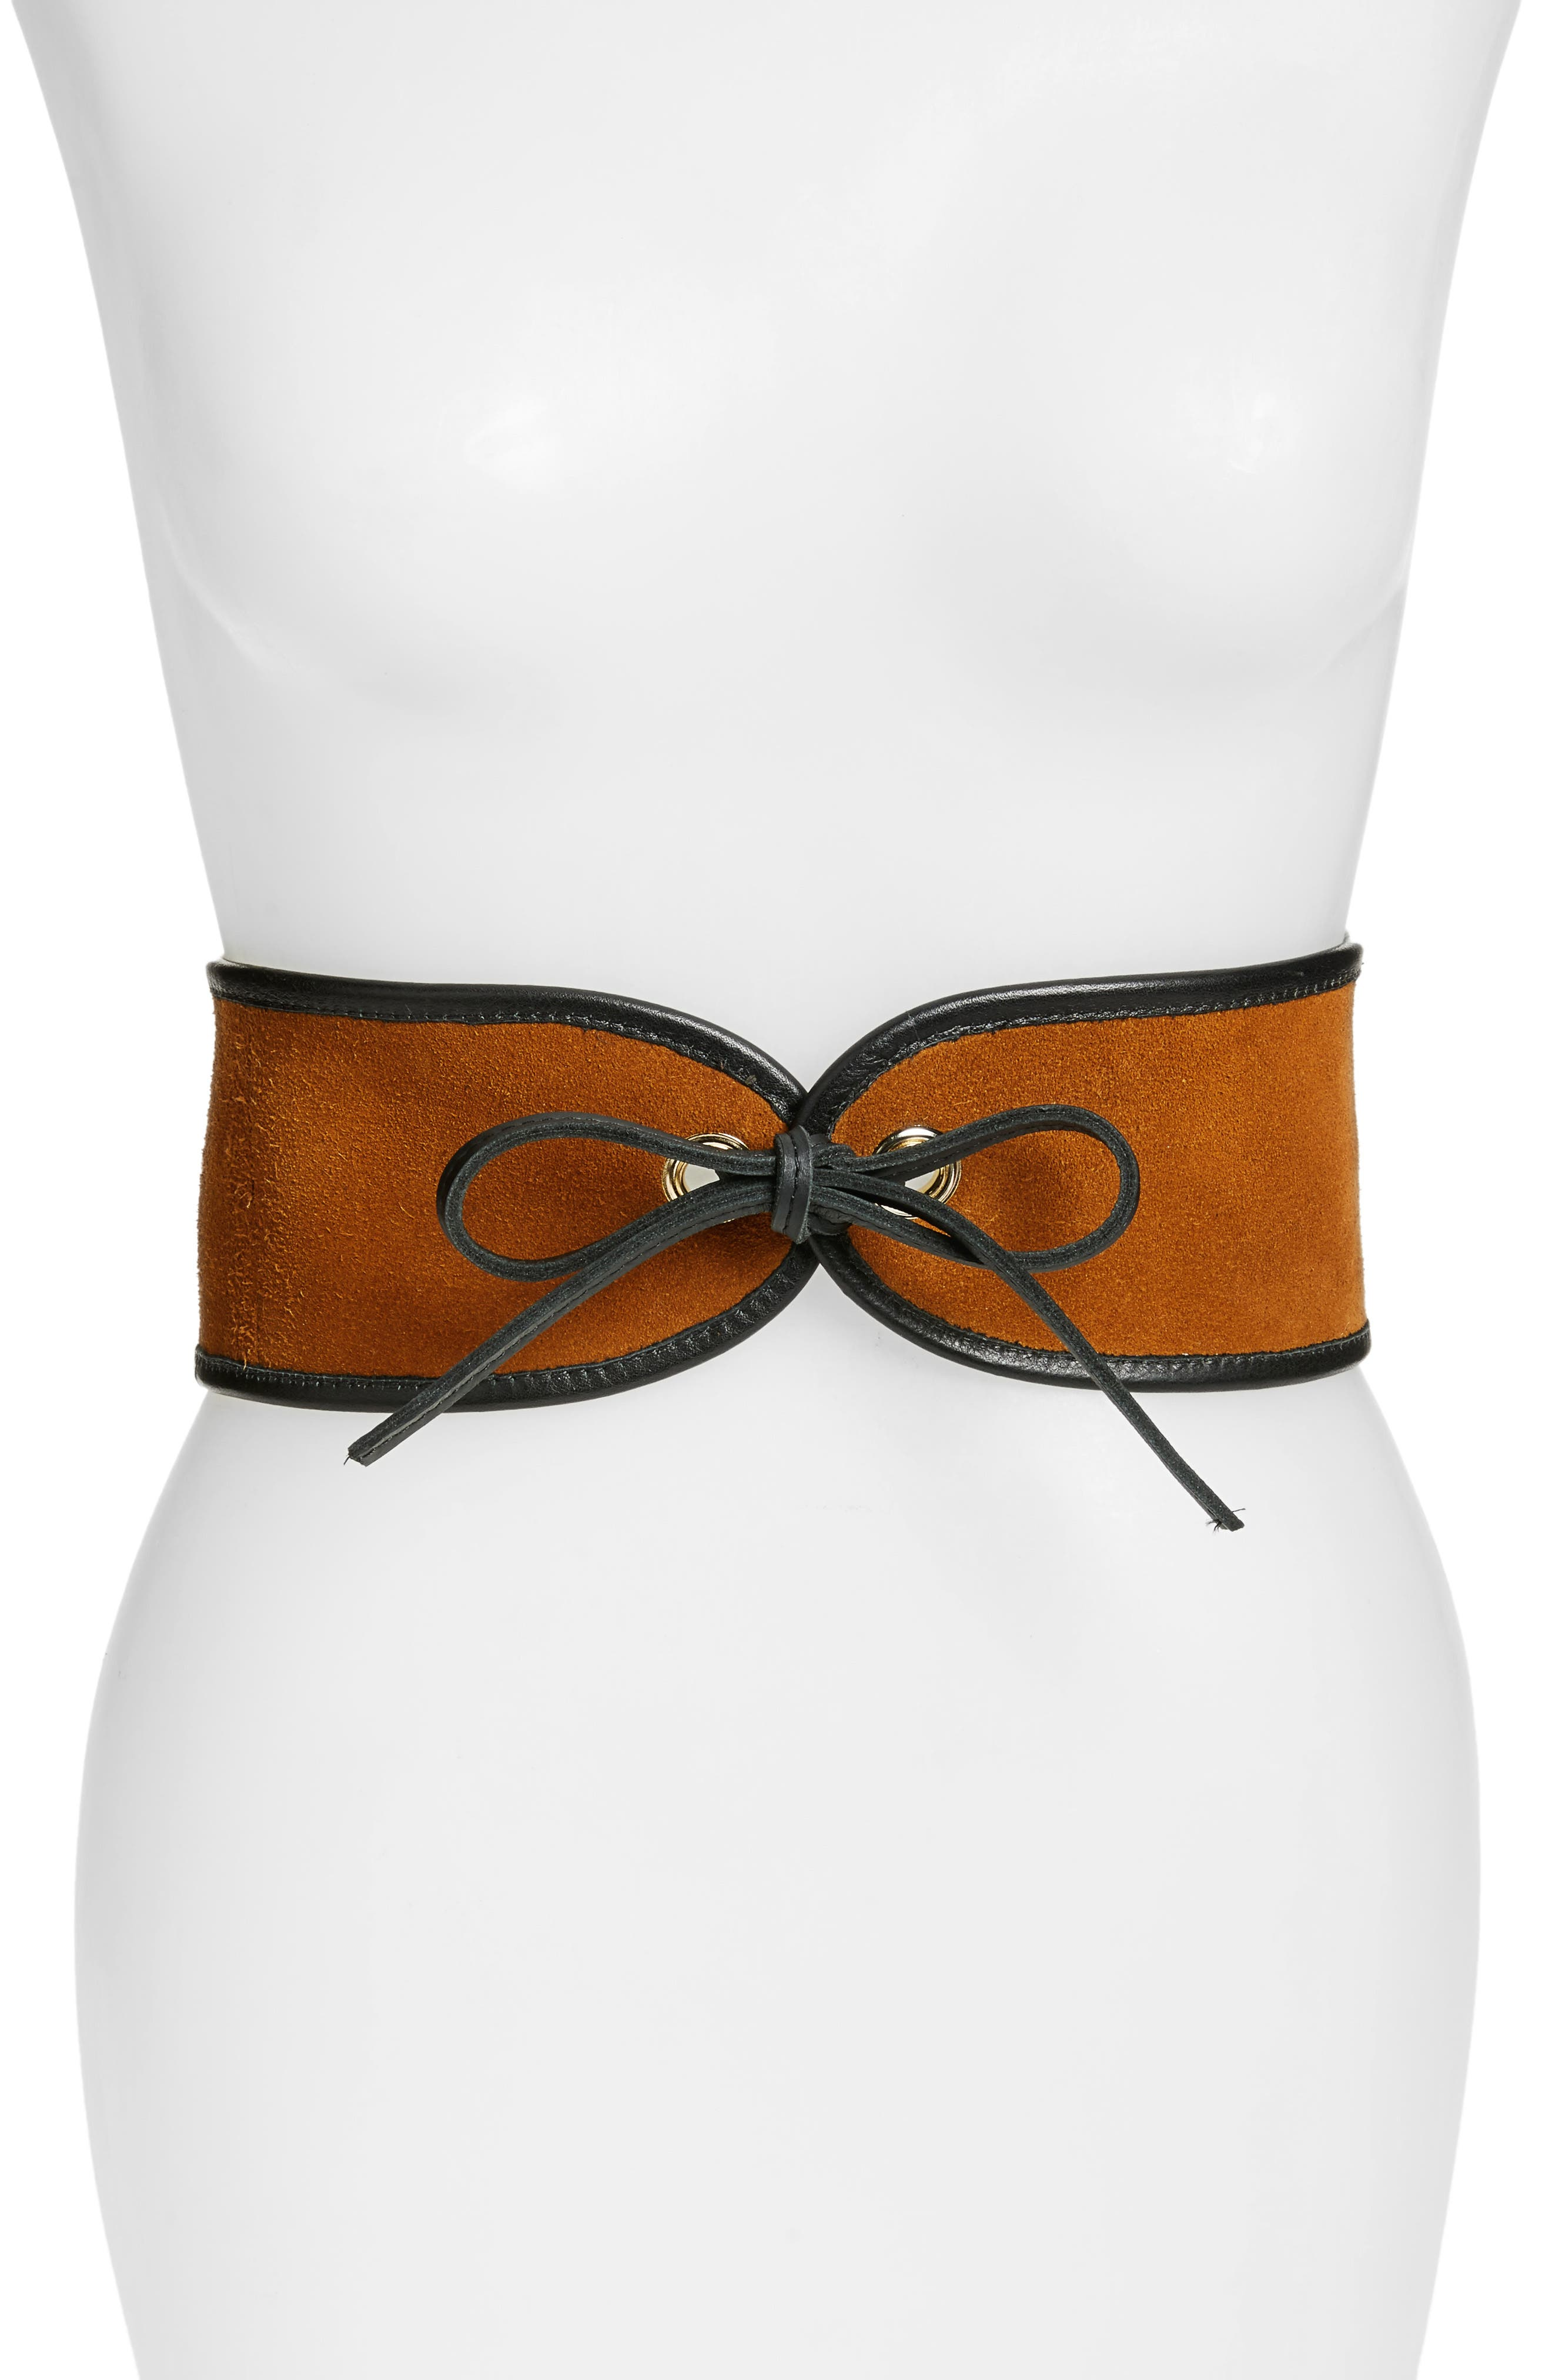 Main Image - Raina Casablanca Leather Corset Belt